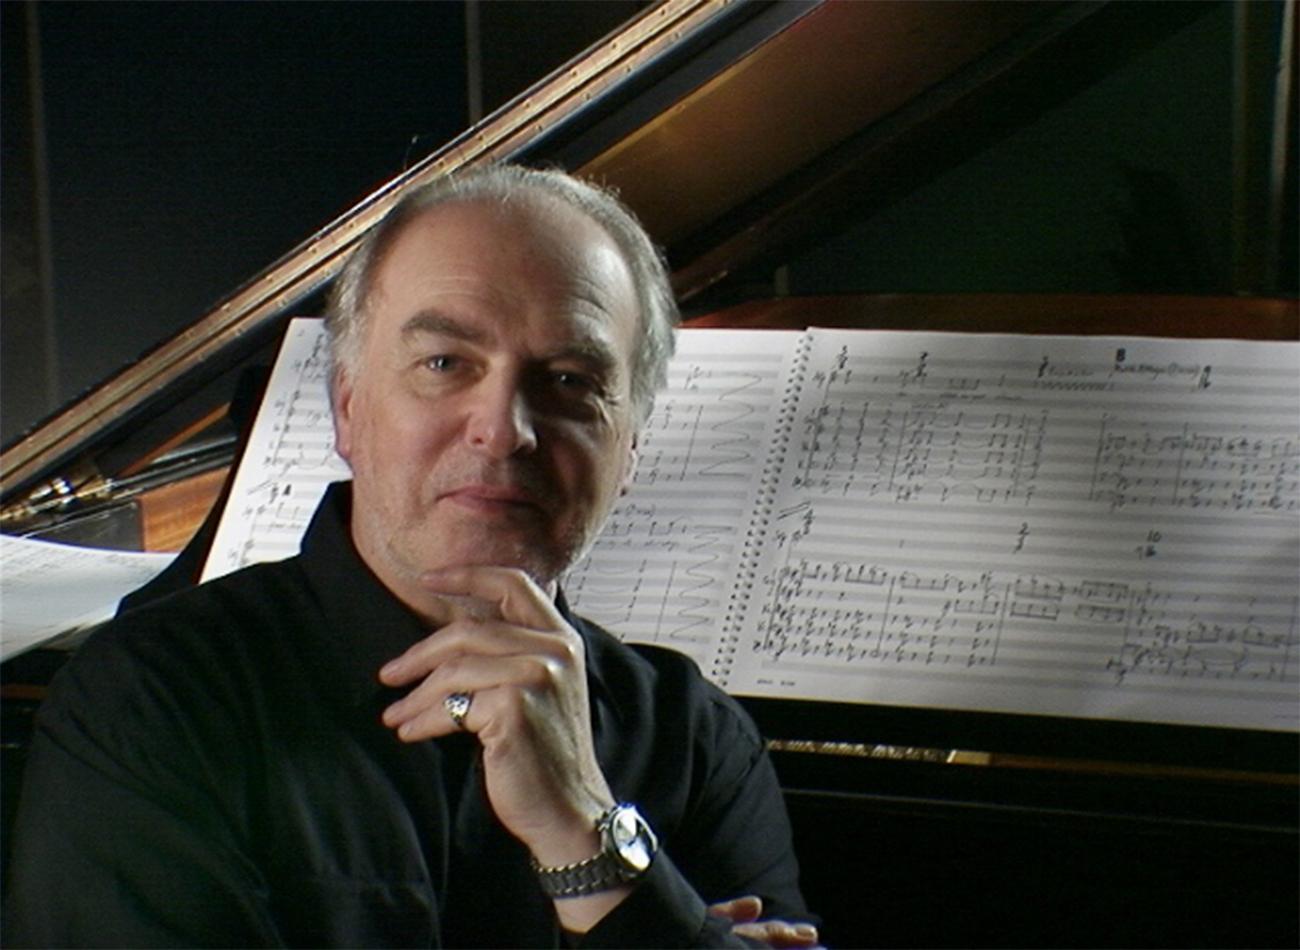 Aberdeen's John McLeod is returning to the city to watch guitarist Ian Watt and pianist Philip Sharp pay tribute to his work.